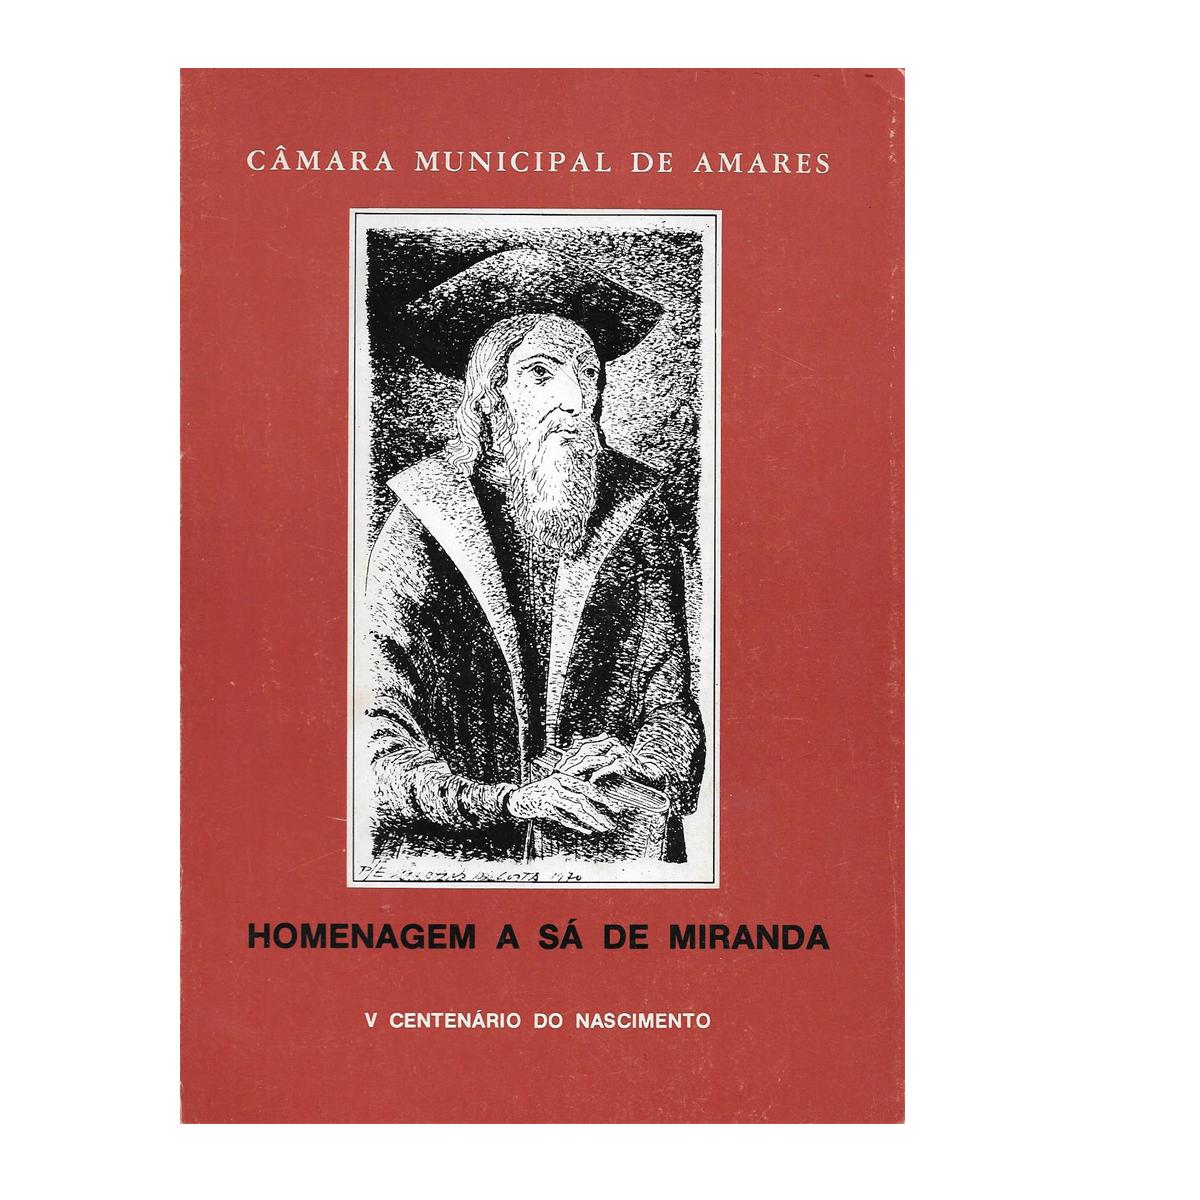 Homenagem a Sá de Miranda.